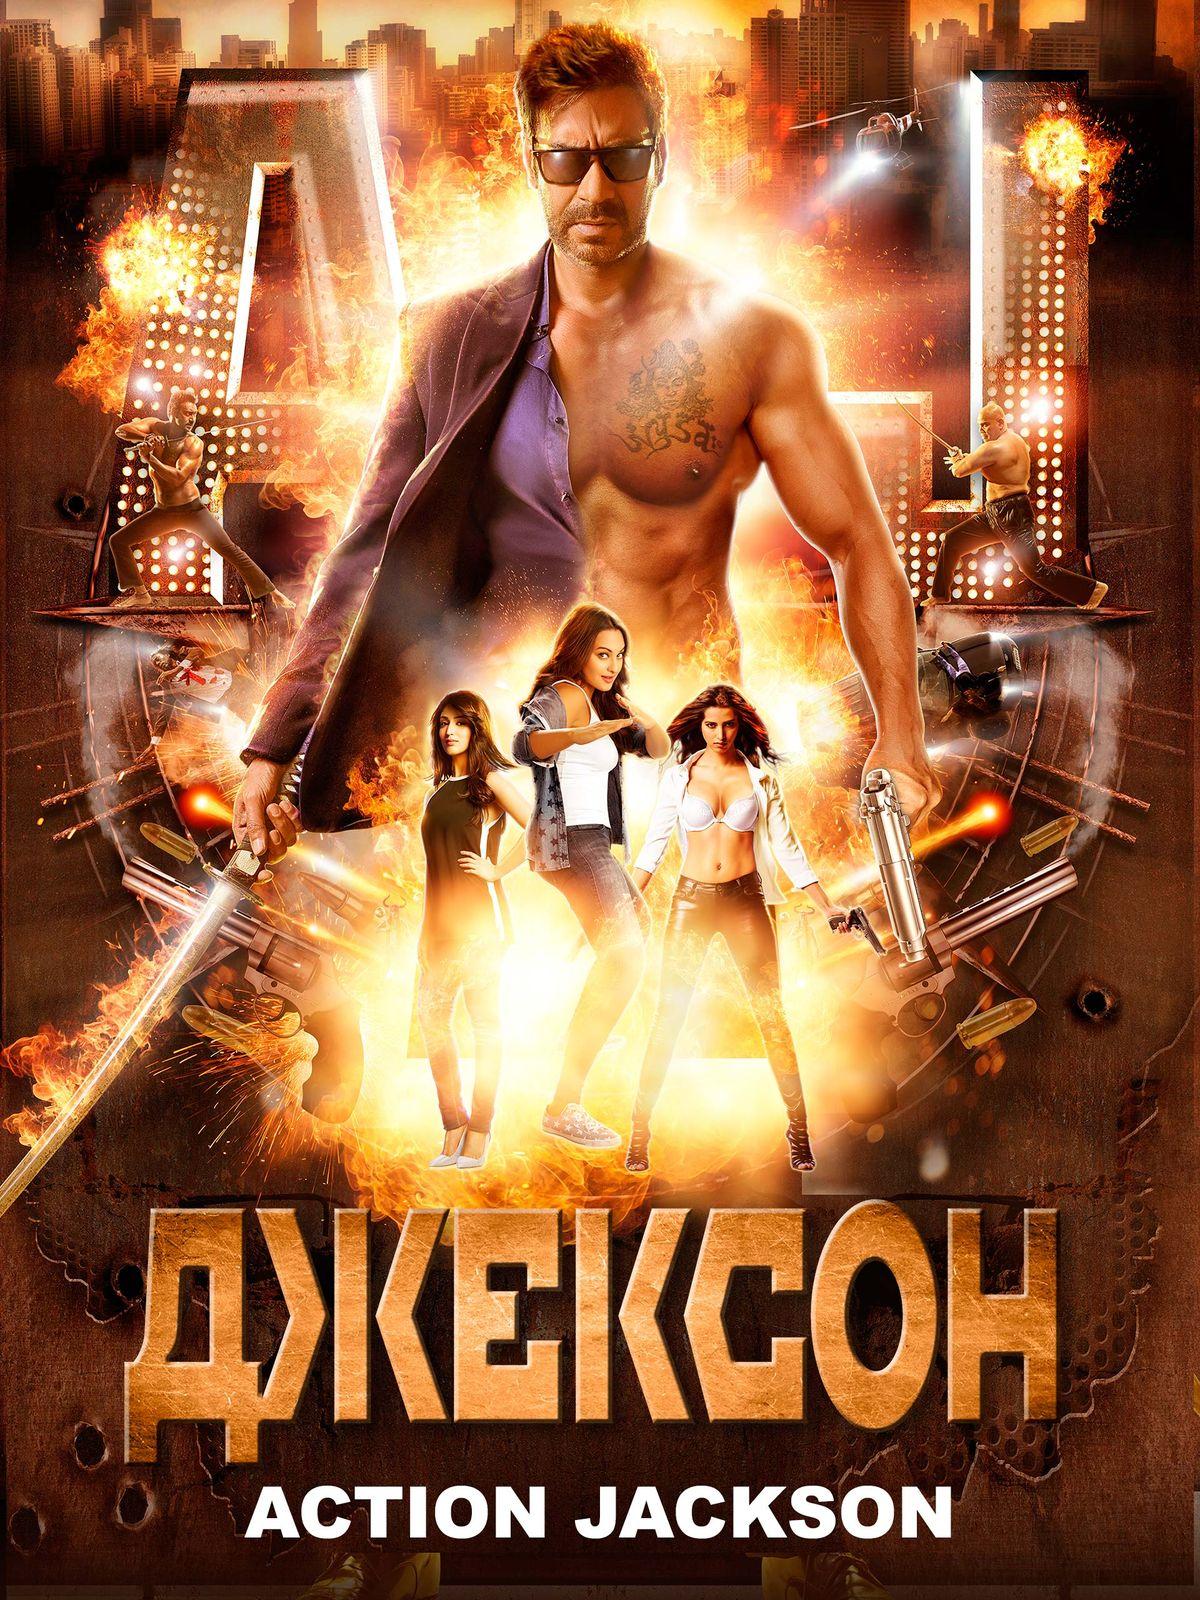 Action Jackson - Russian